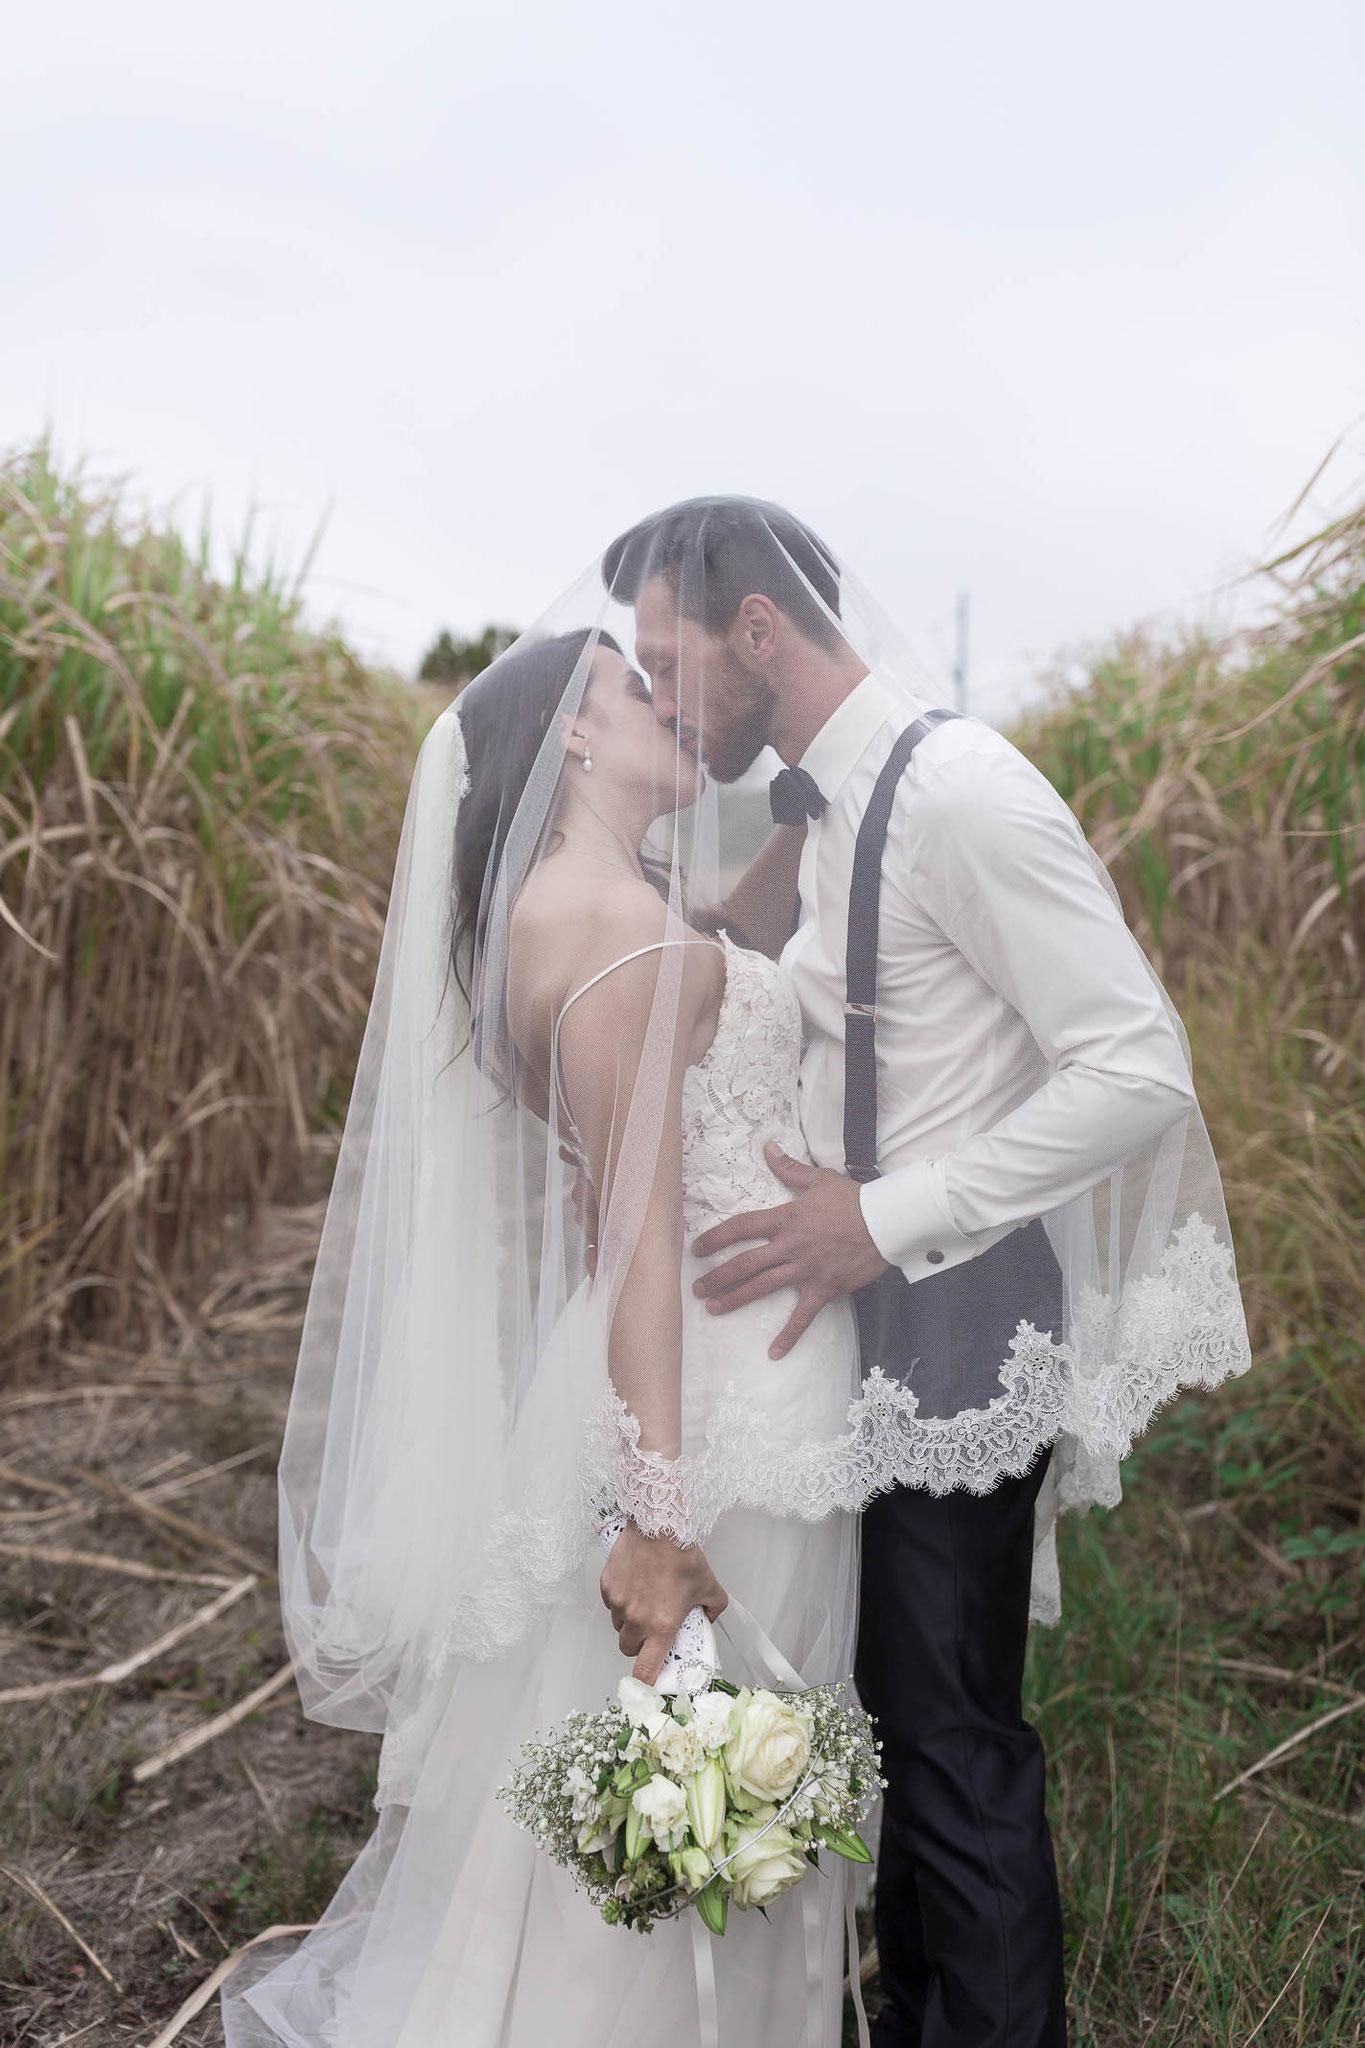 Stilvolles Shooting mit dem Brautpaar